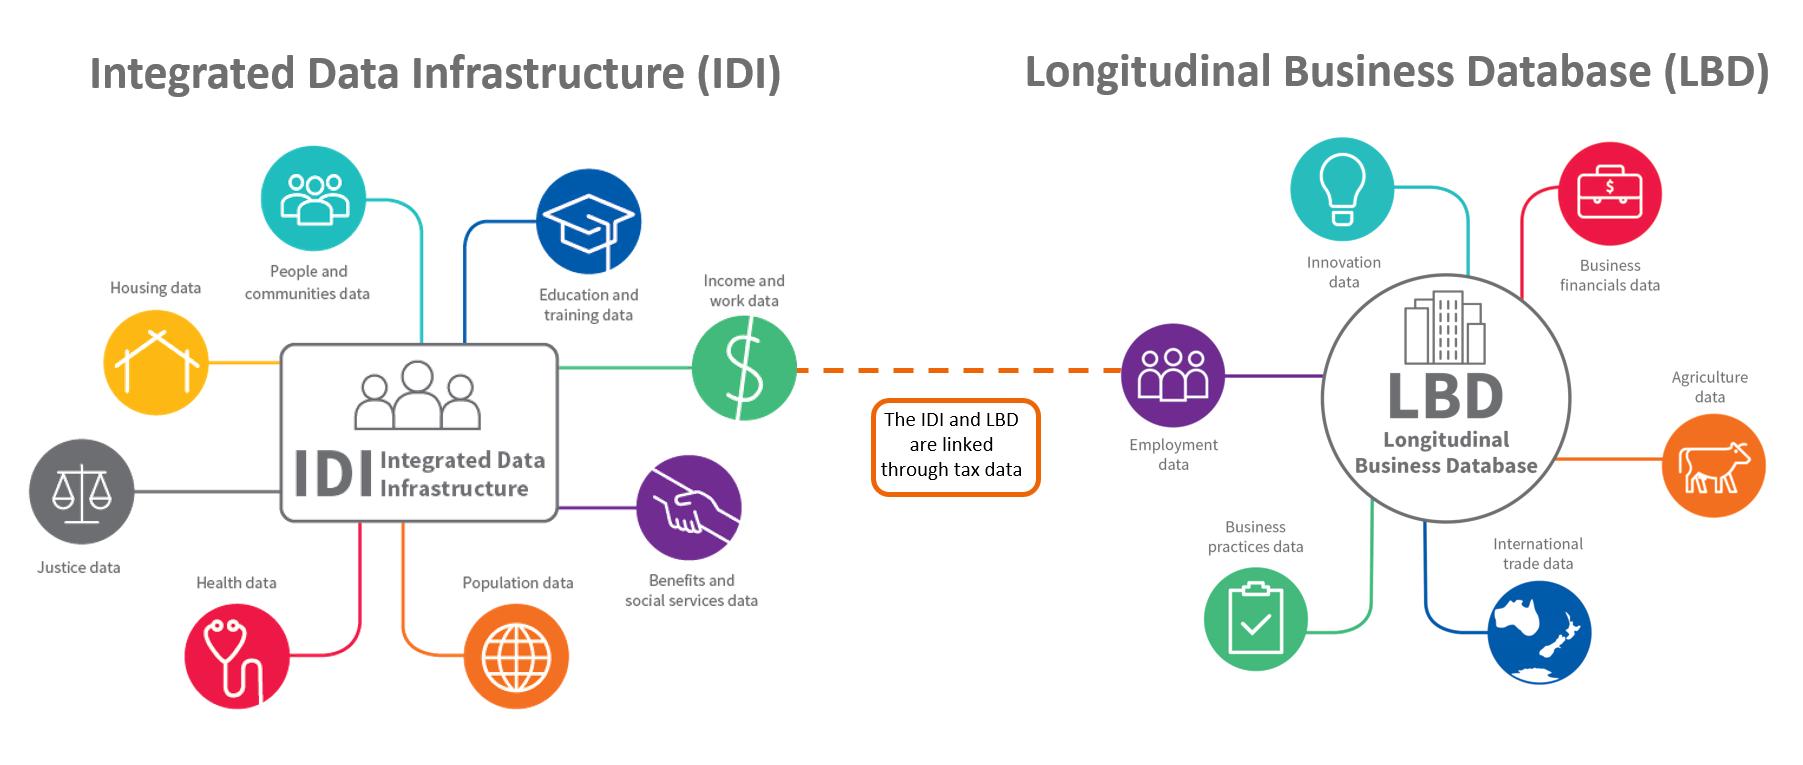 Integrated Data Infrastructure and Longitudinal Business Database